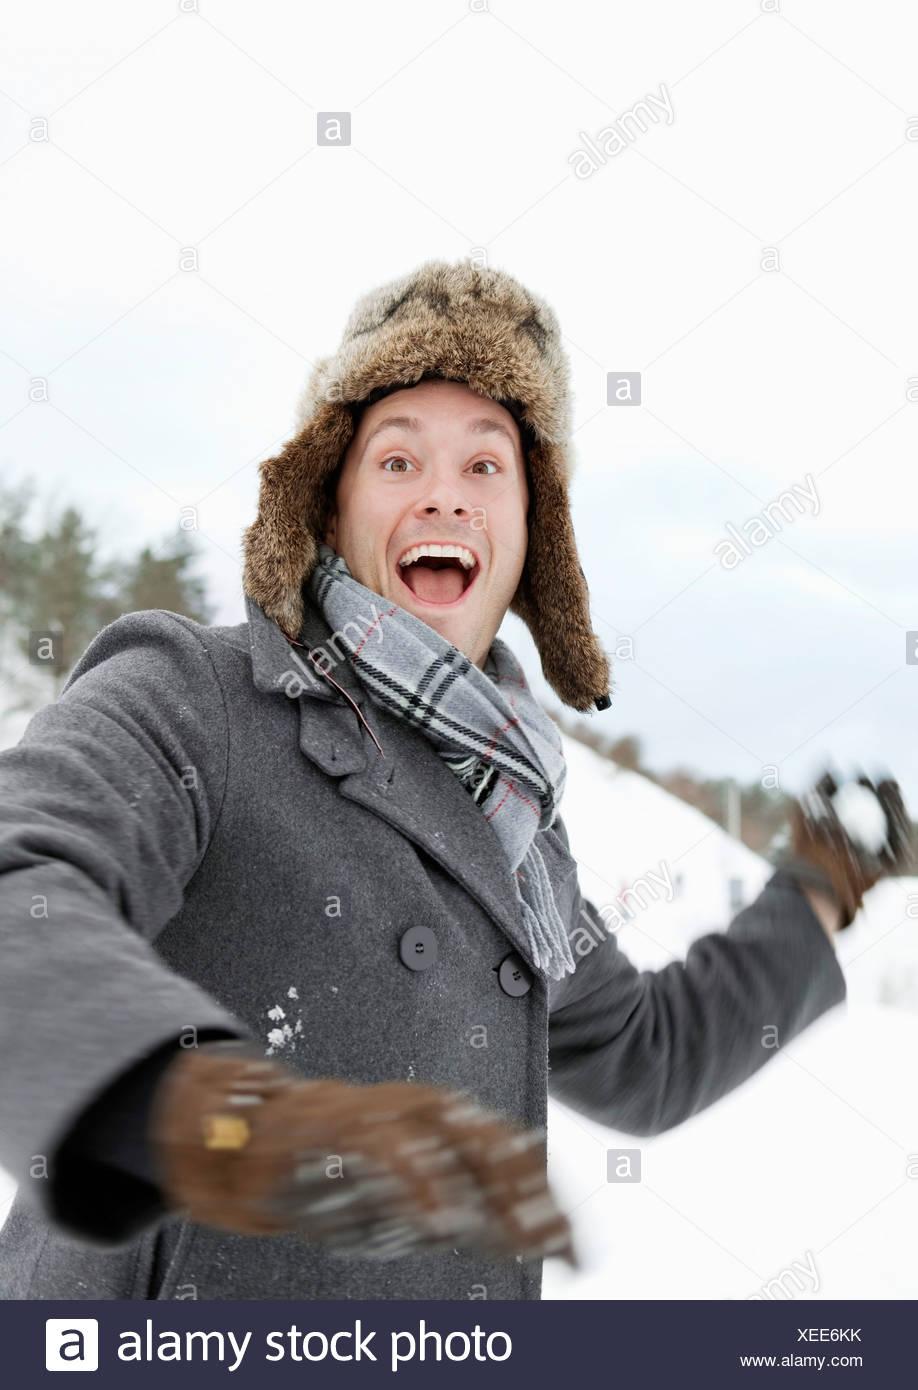 Man throwing snowball - Stock Image